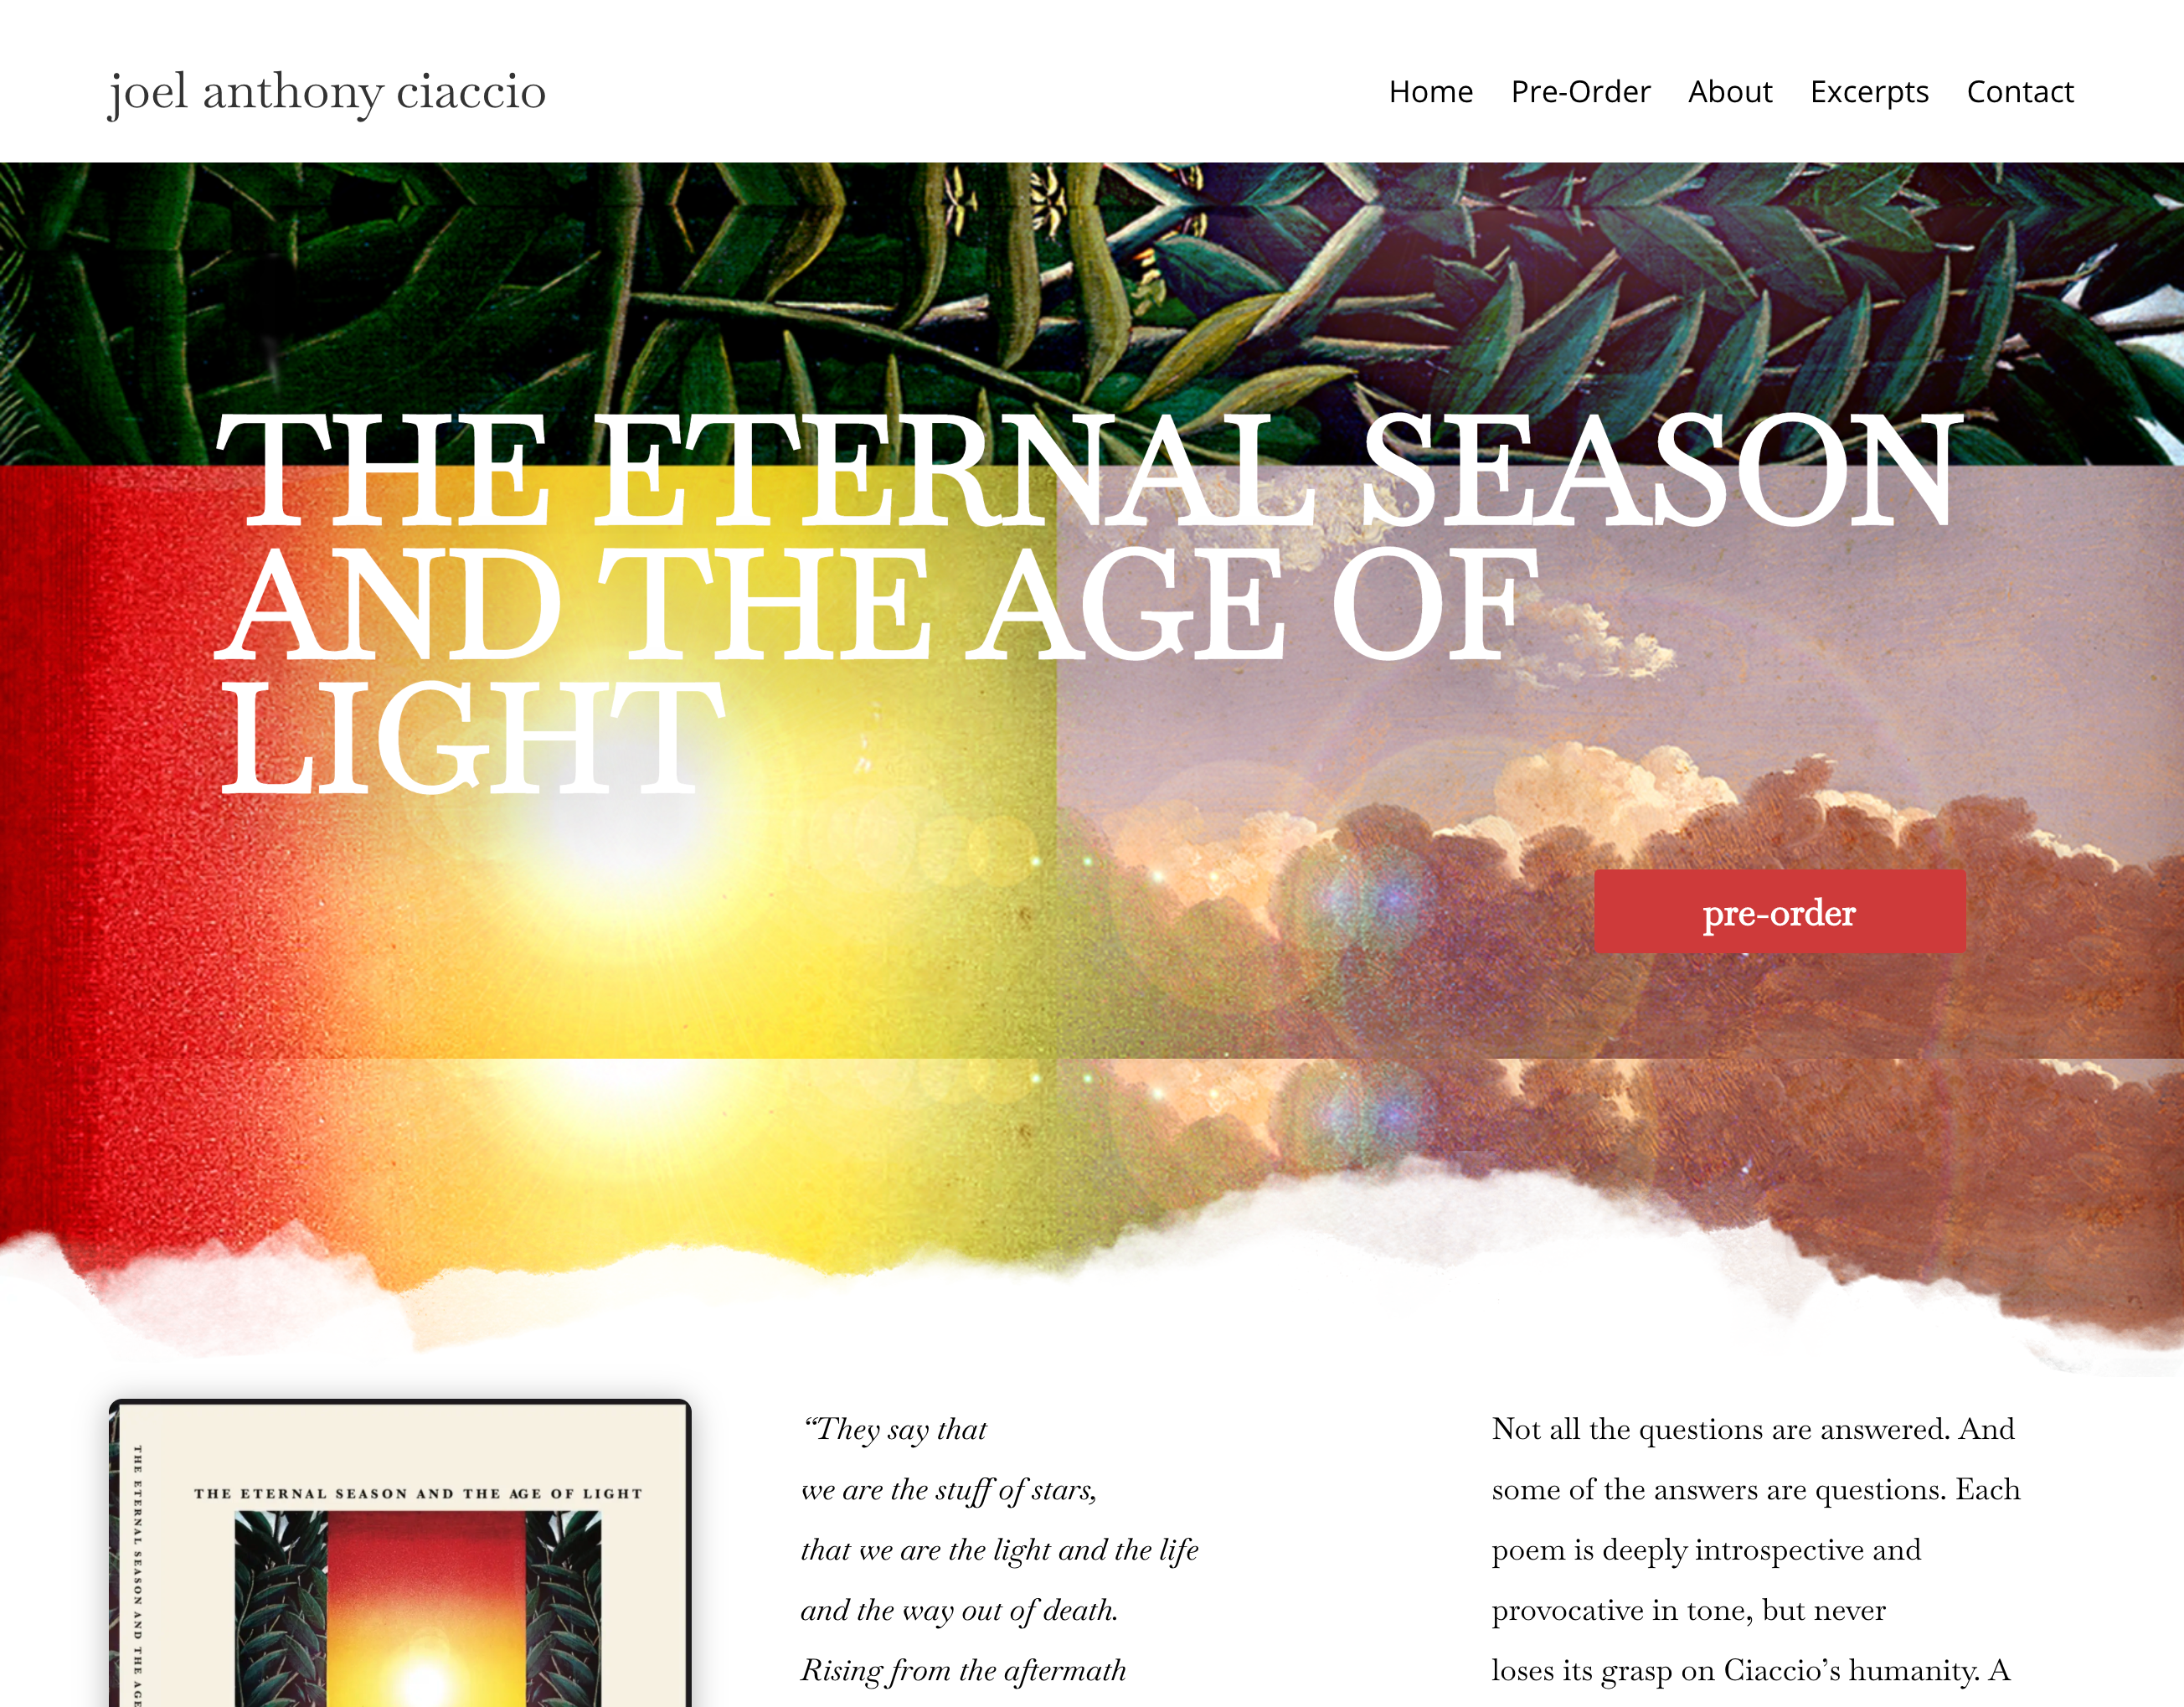 thejacpoet-baltimore author-website